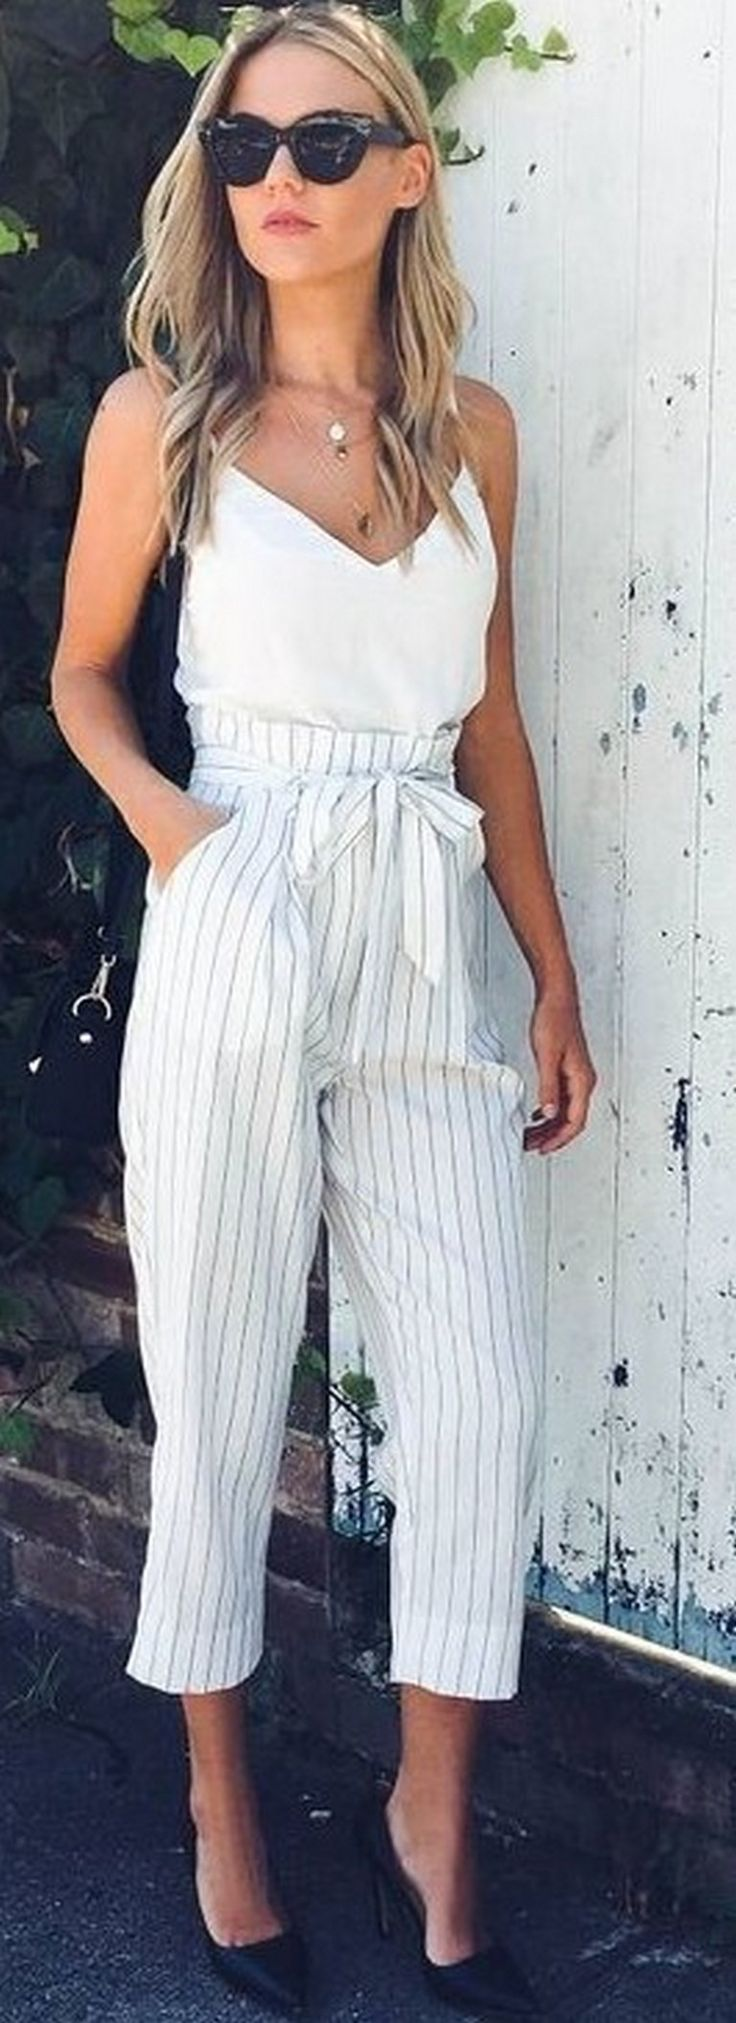 Best Summer Street Style: Best 20+ Brunch Outfit Ideas On Pinterest